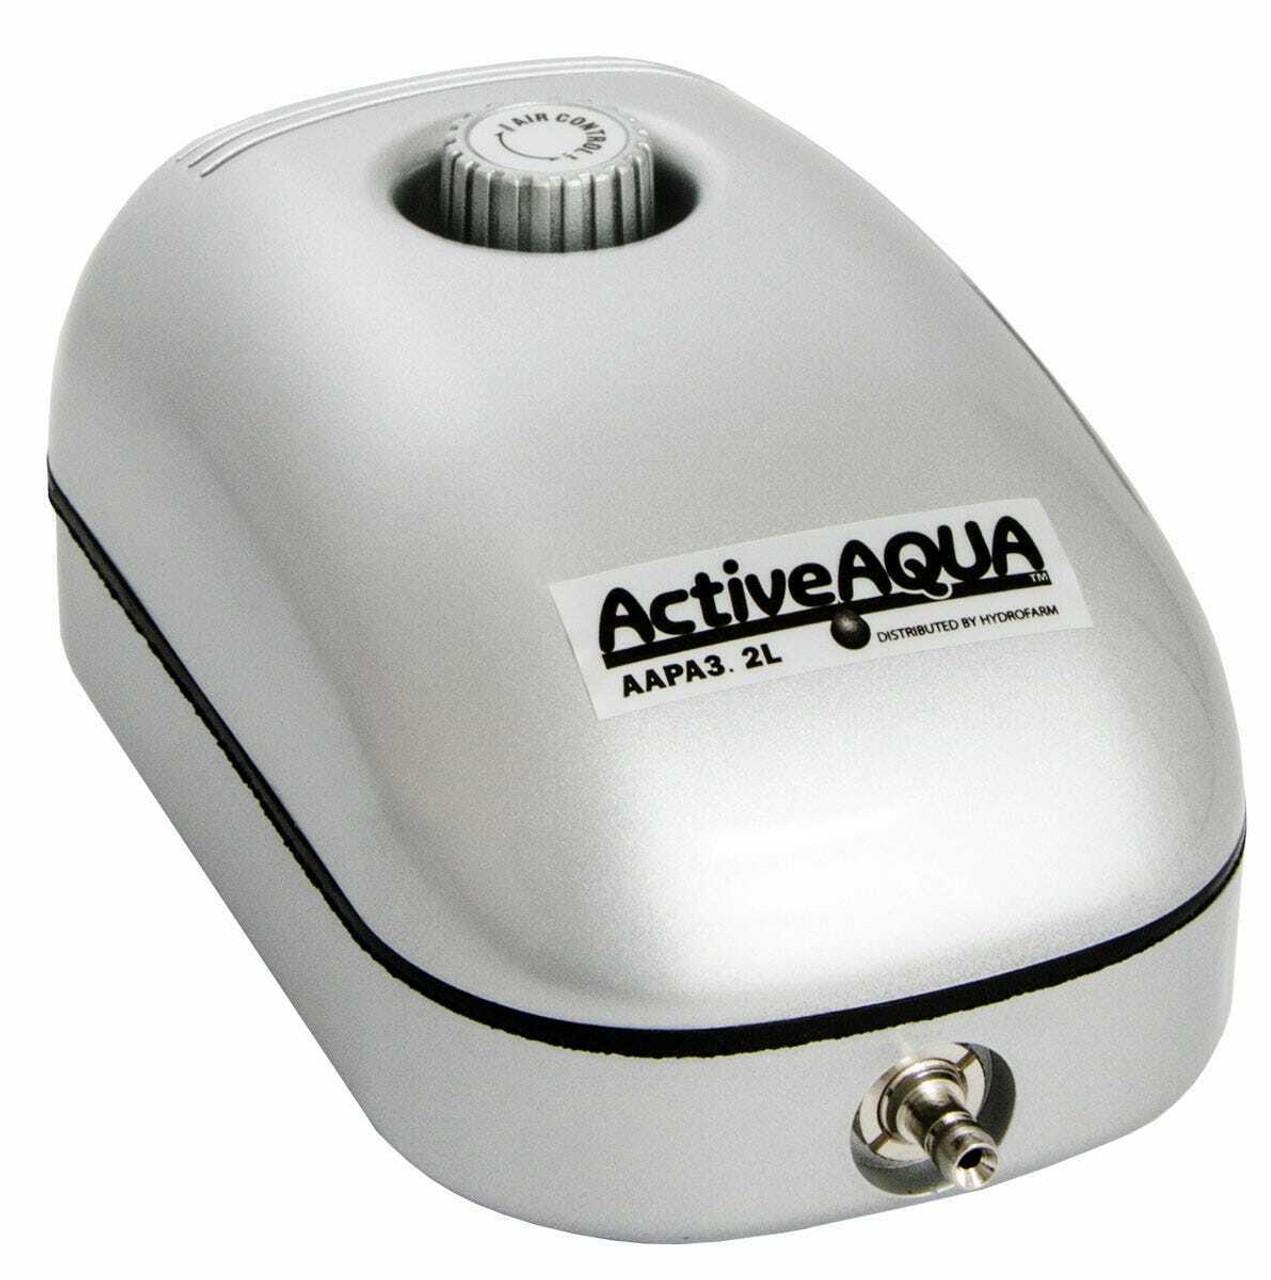 Air Pump 1 Outlet 2W 3.2L/min - 3